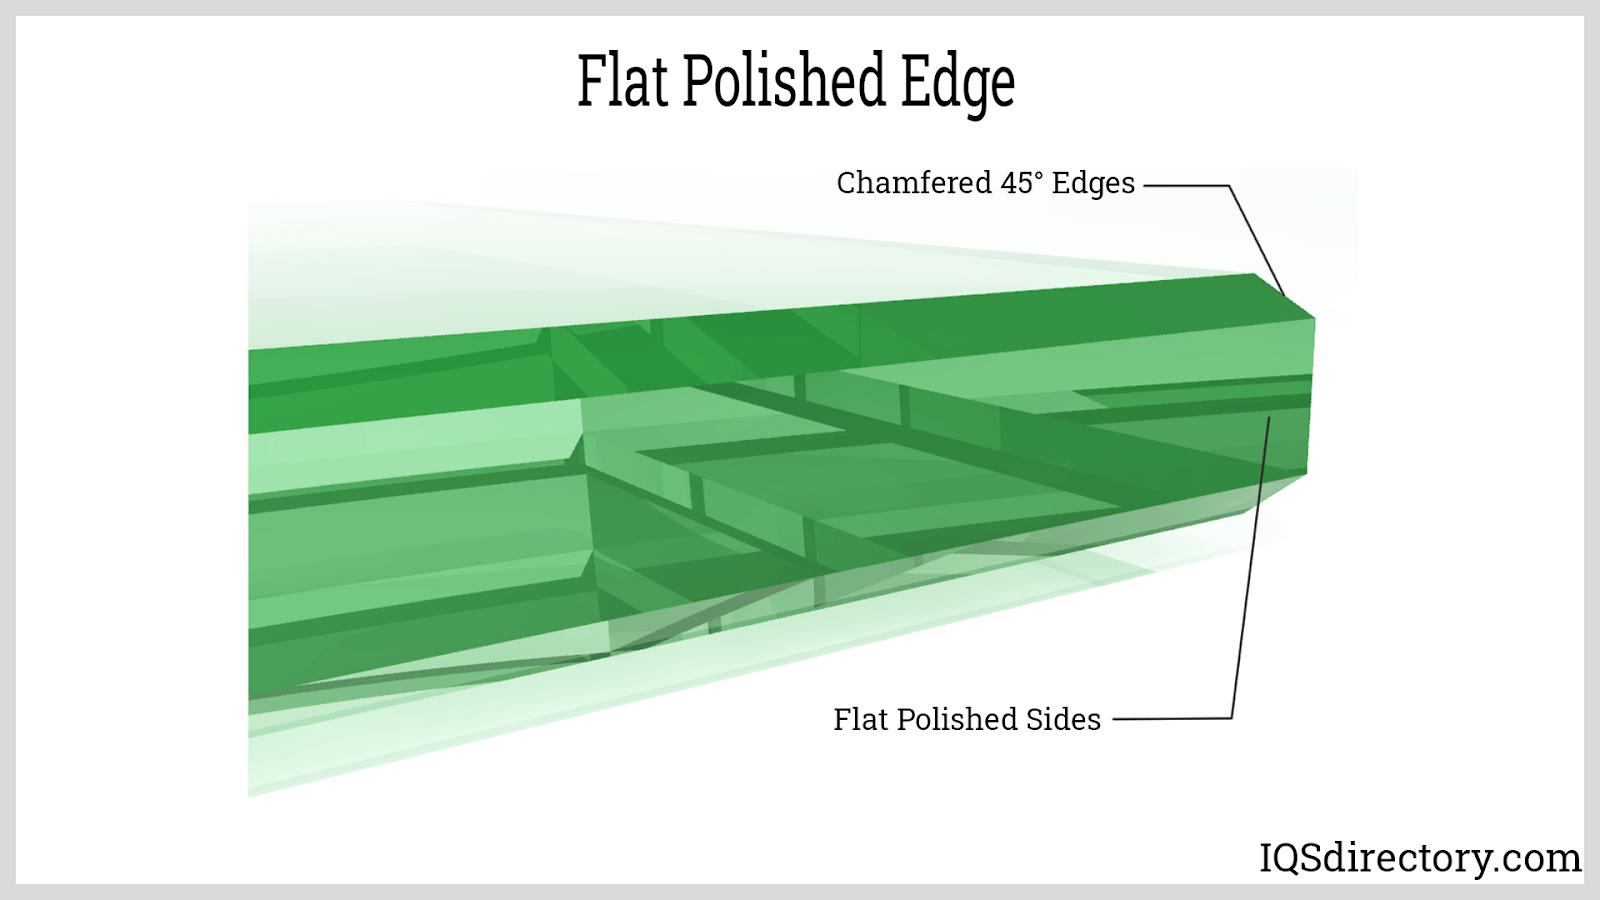 Flat Polished Edge